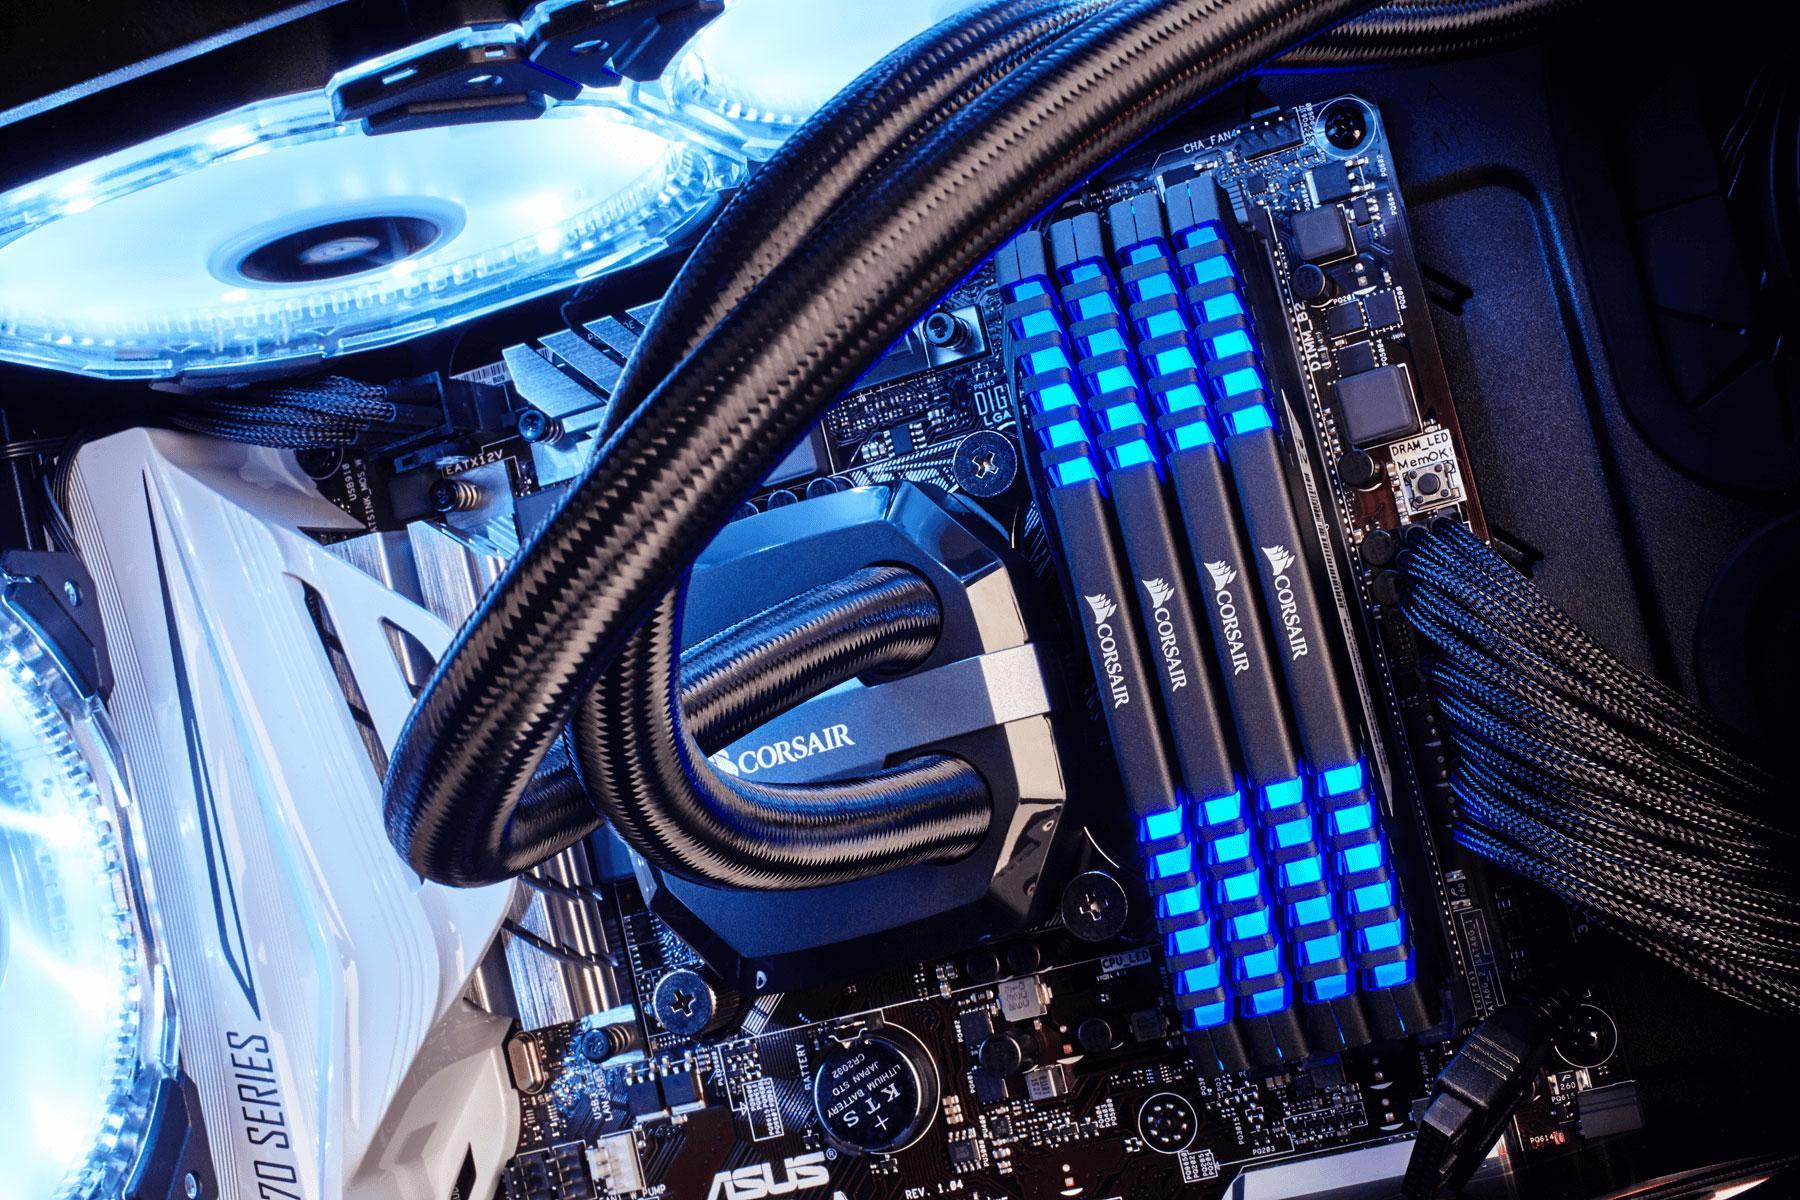 Corsair Vengeance LED 32GB (4x8GB) DDR4 3000 (PC4-24000 ...